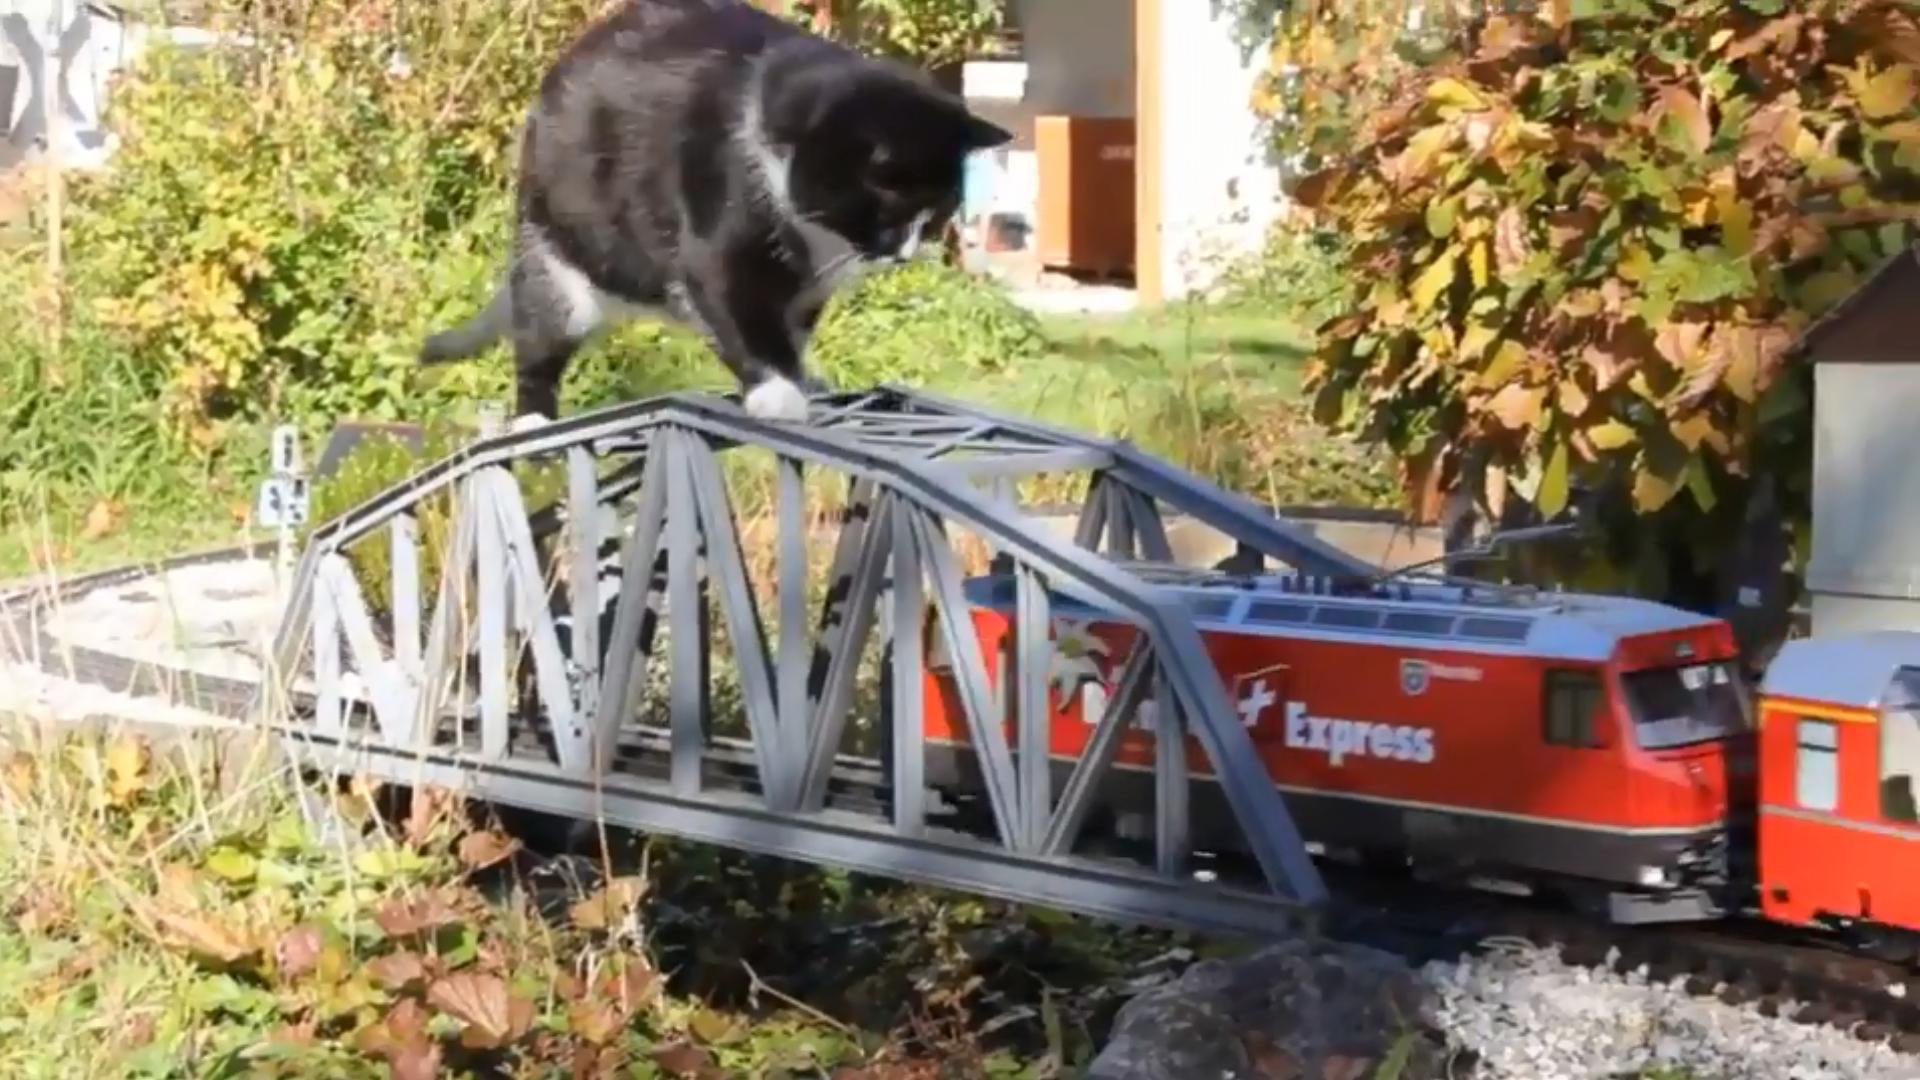 Gゲージ ねこやん 庭園鉄道 Neko Cat スイス 氷河急行 庭園鉄道 猫 ねこ